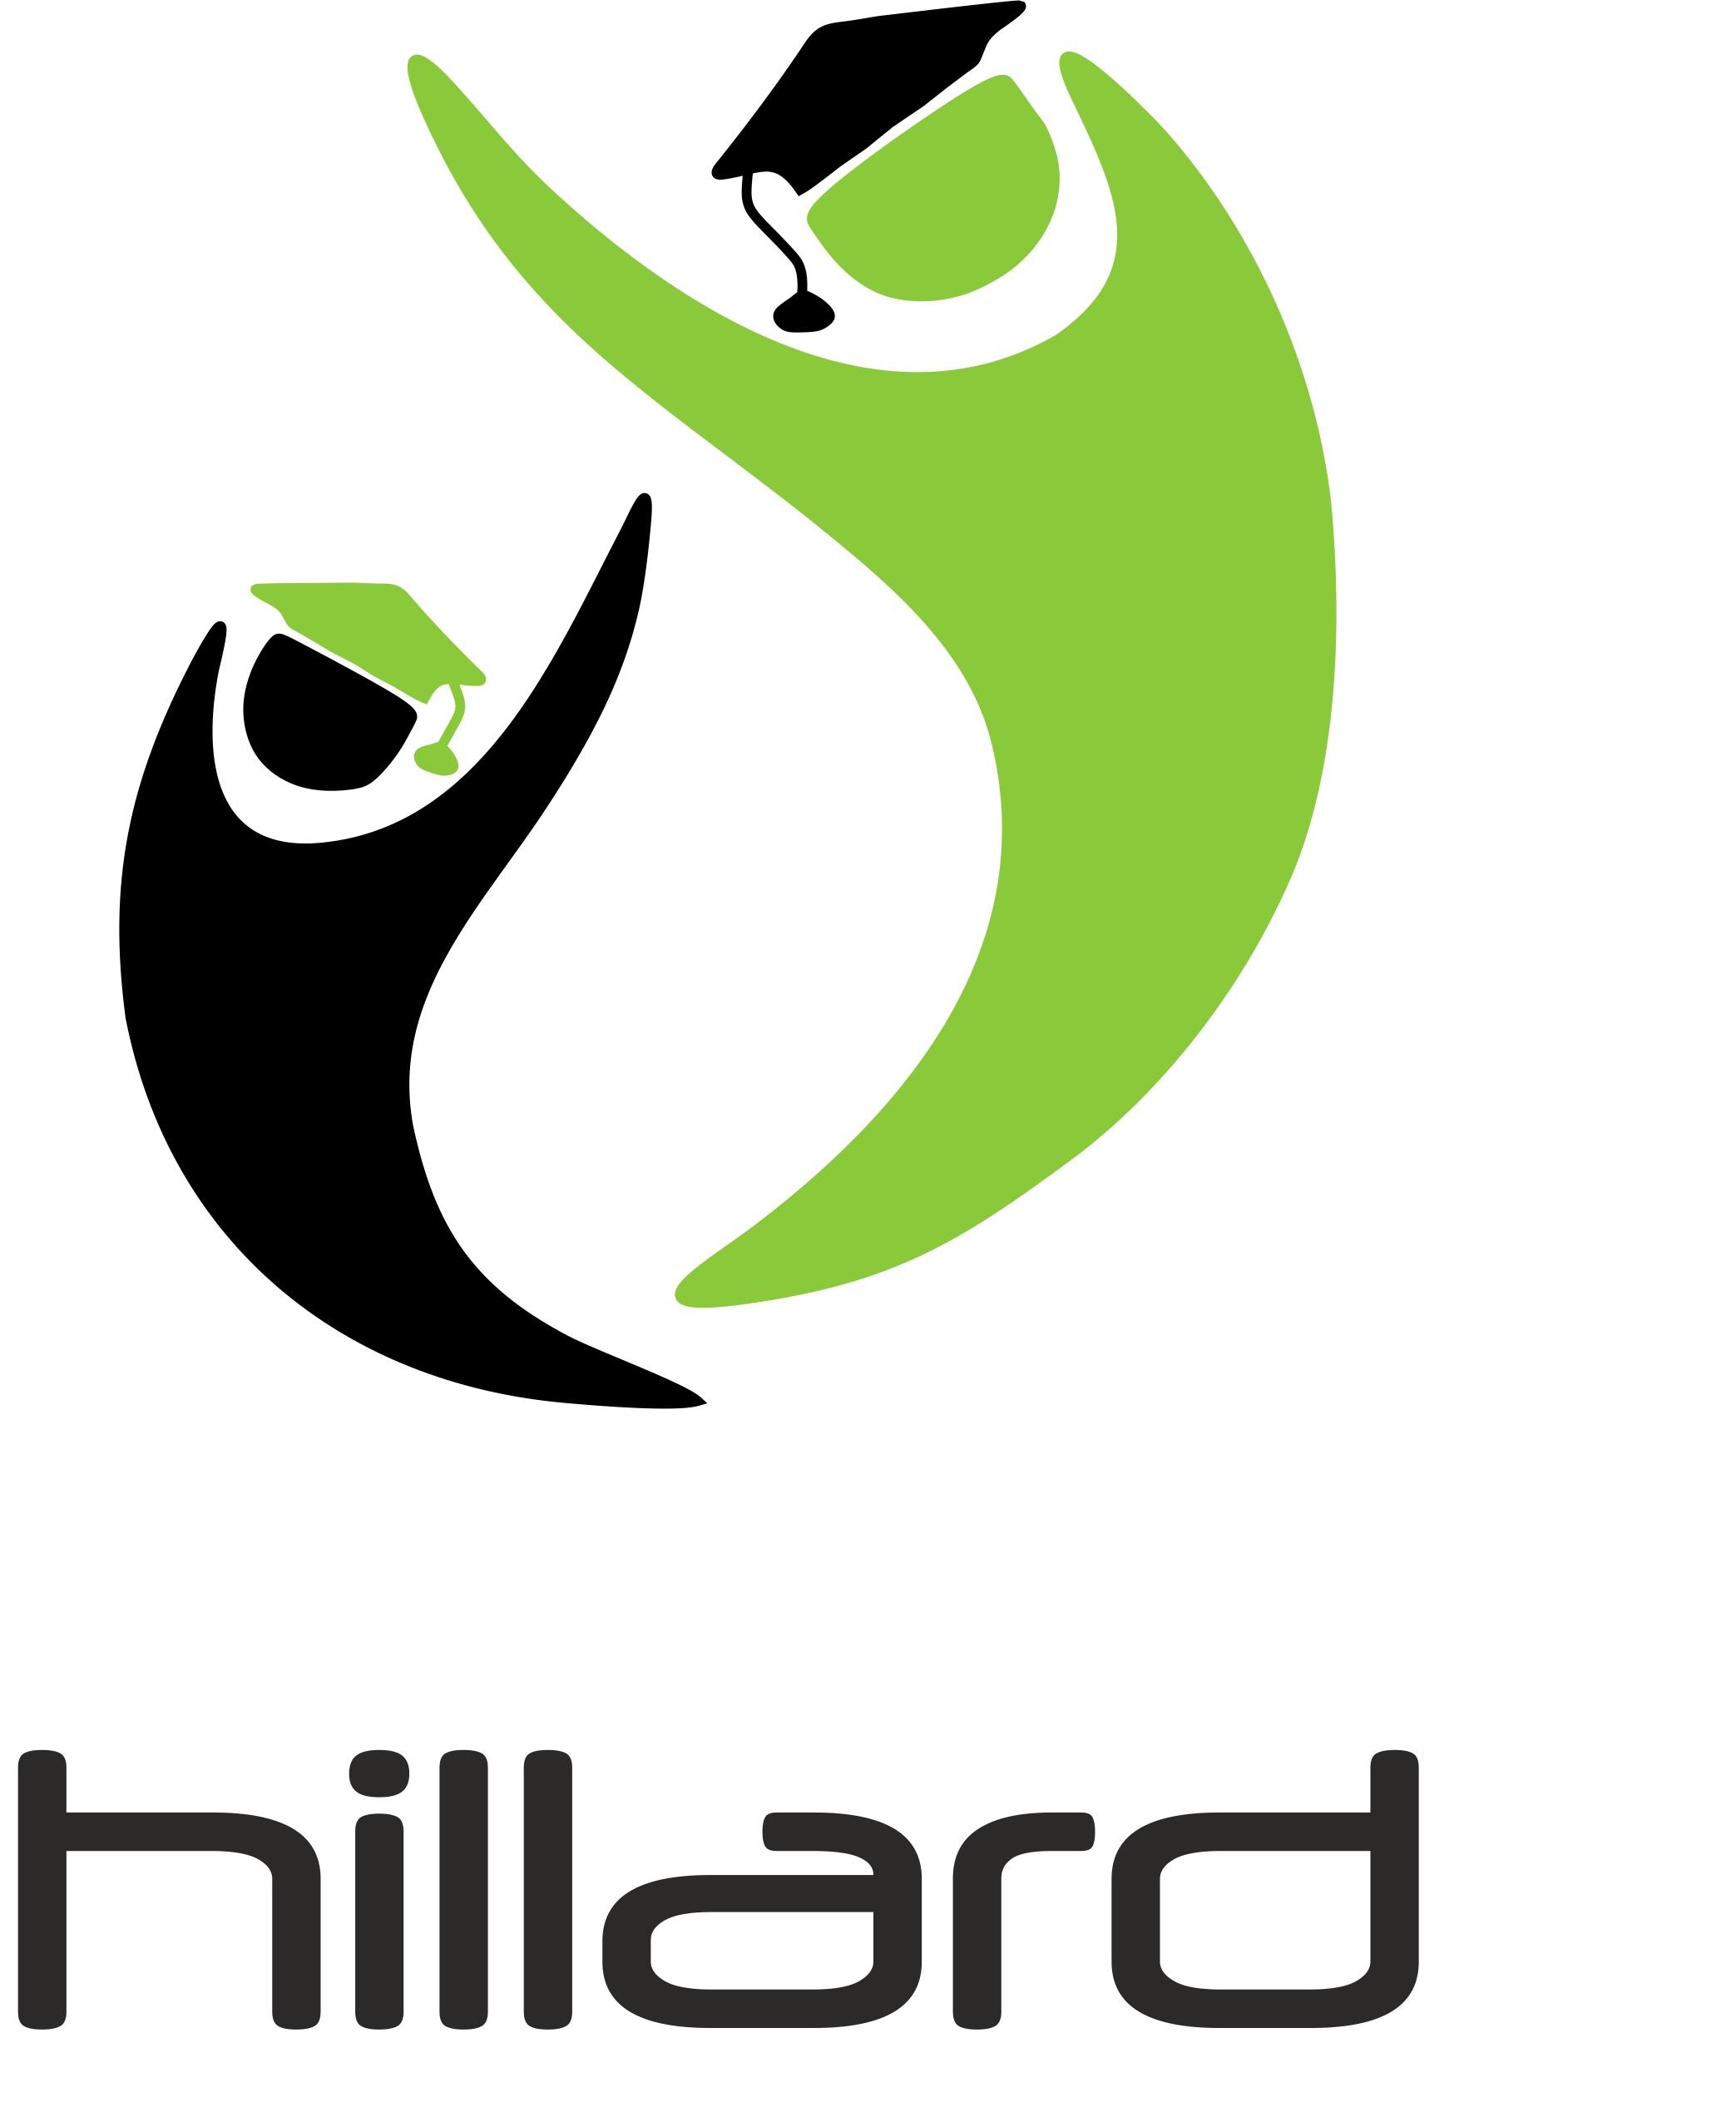 Hillard School of Foreign Languages